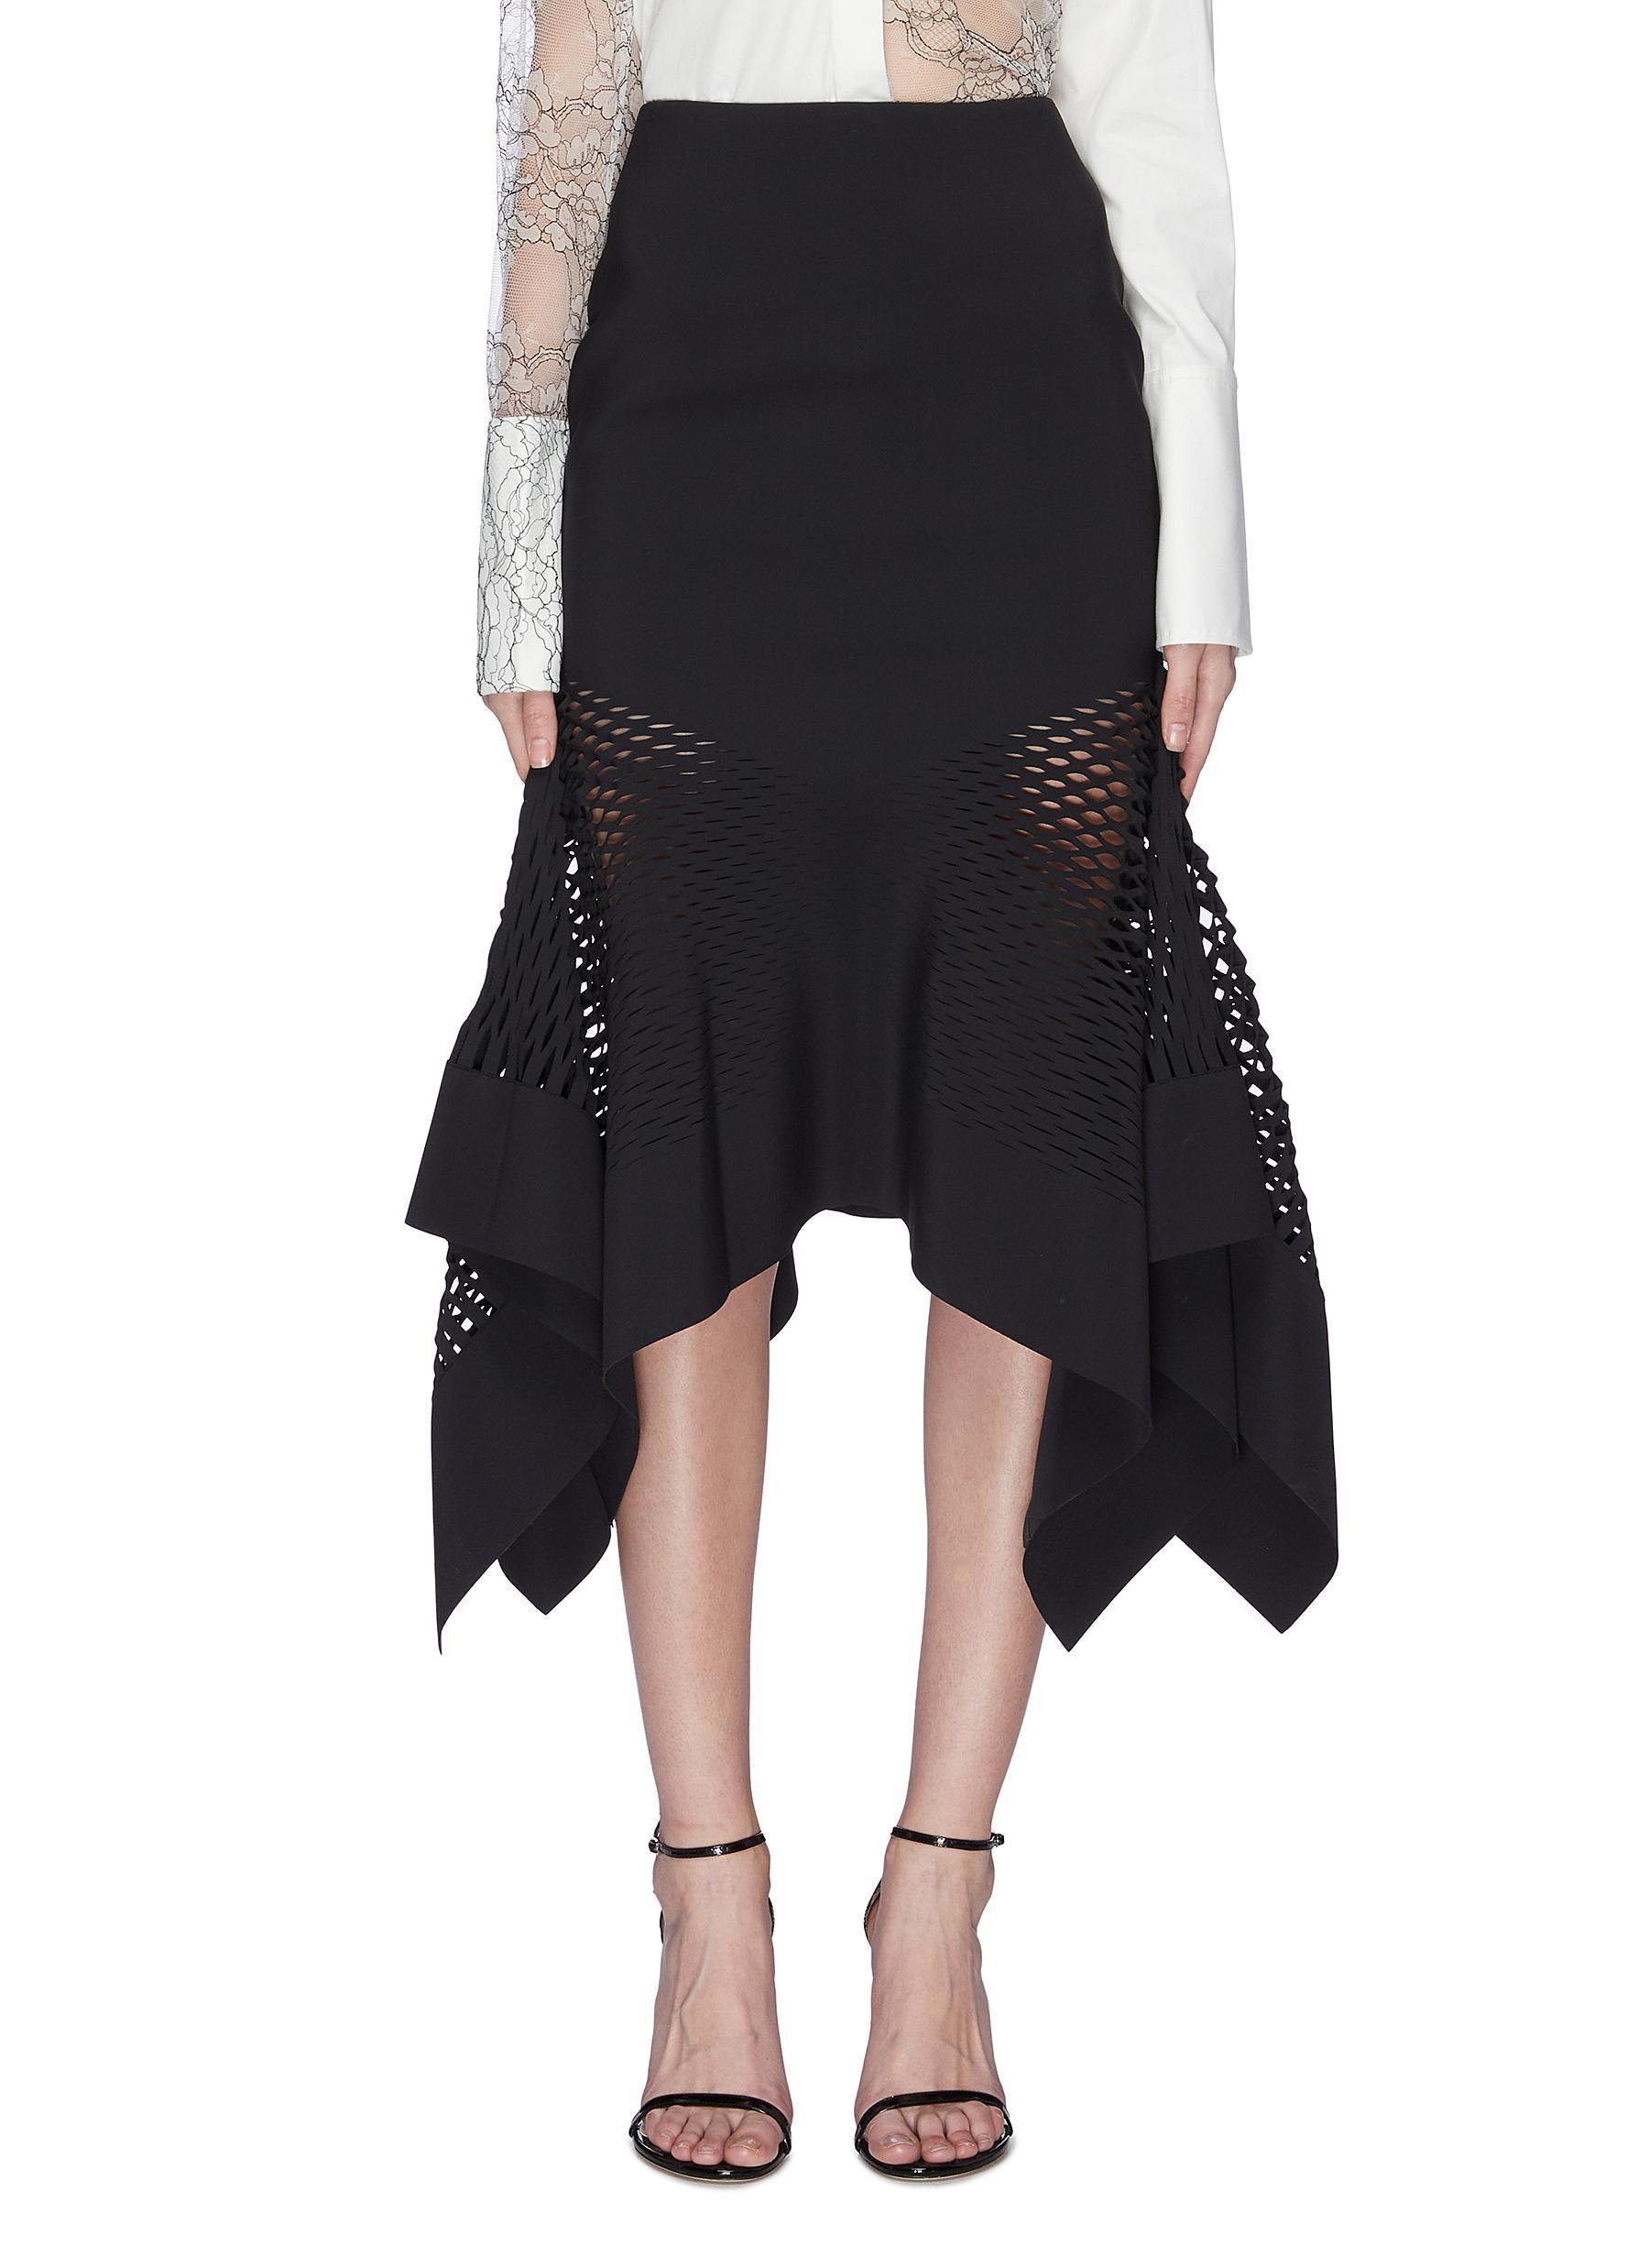 ae8e1a7253 Lyst - Dion Lee 'honeycomb' Lasercut Handkerchief Skirt in Black